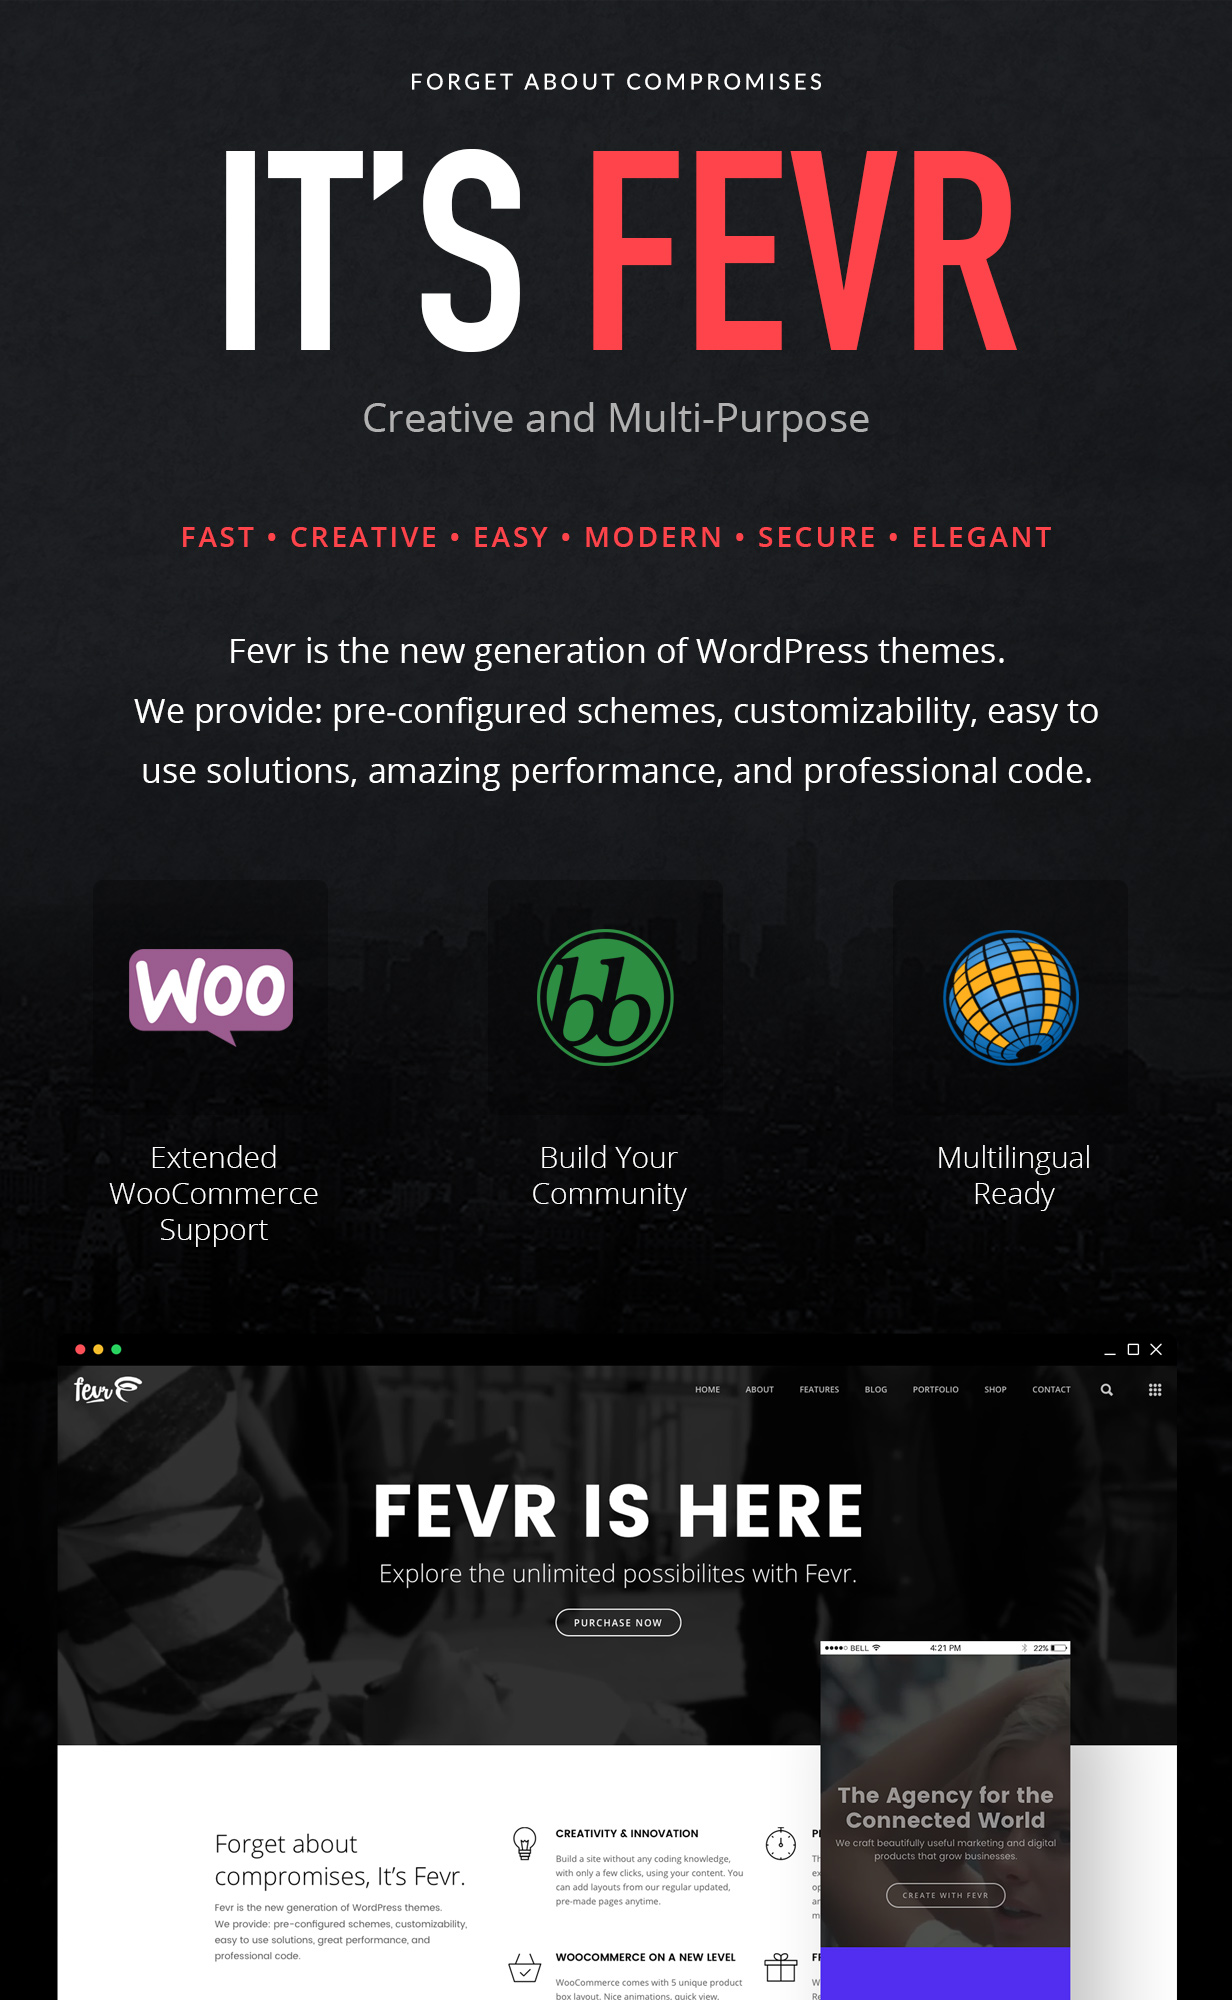 1616363884 464 welcome - Fevr - Creative MultiPurpose Theme